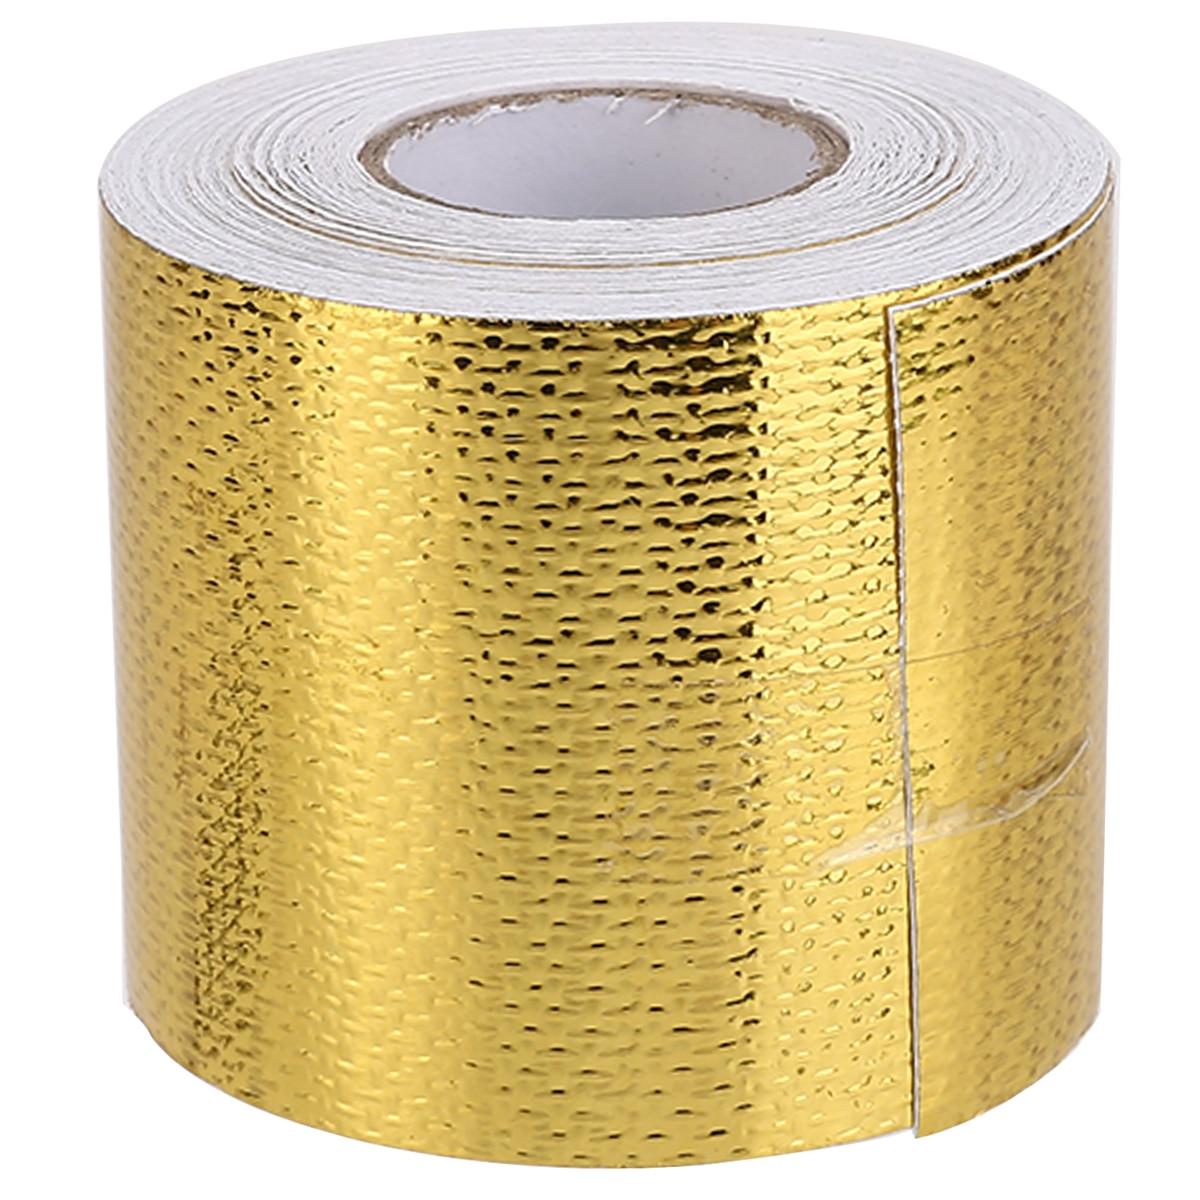 Universal 9M*5cm Car Heat Insulation Heat Shield Reflective Fiberglass Tape Engine Pipe Cover Auto Temperature Isolated